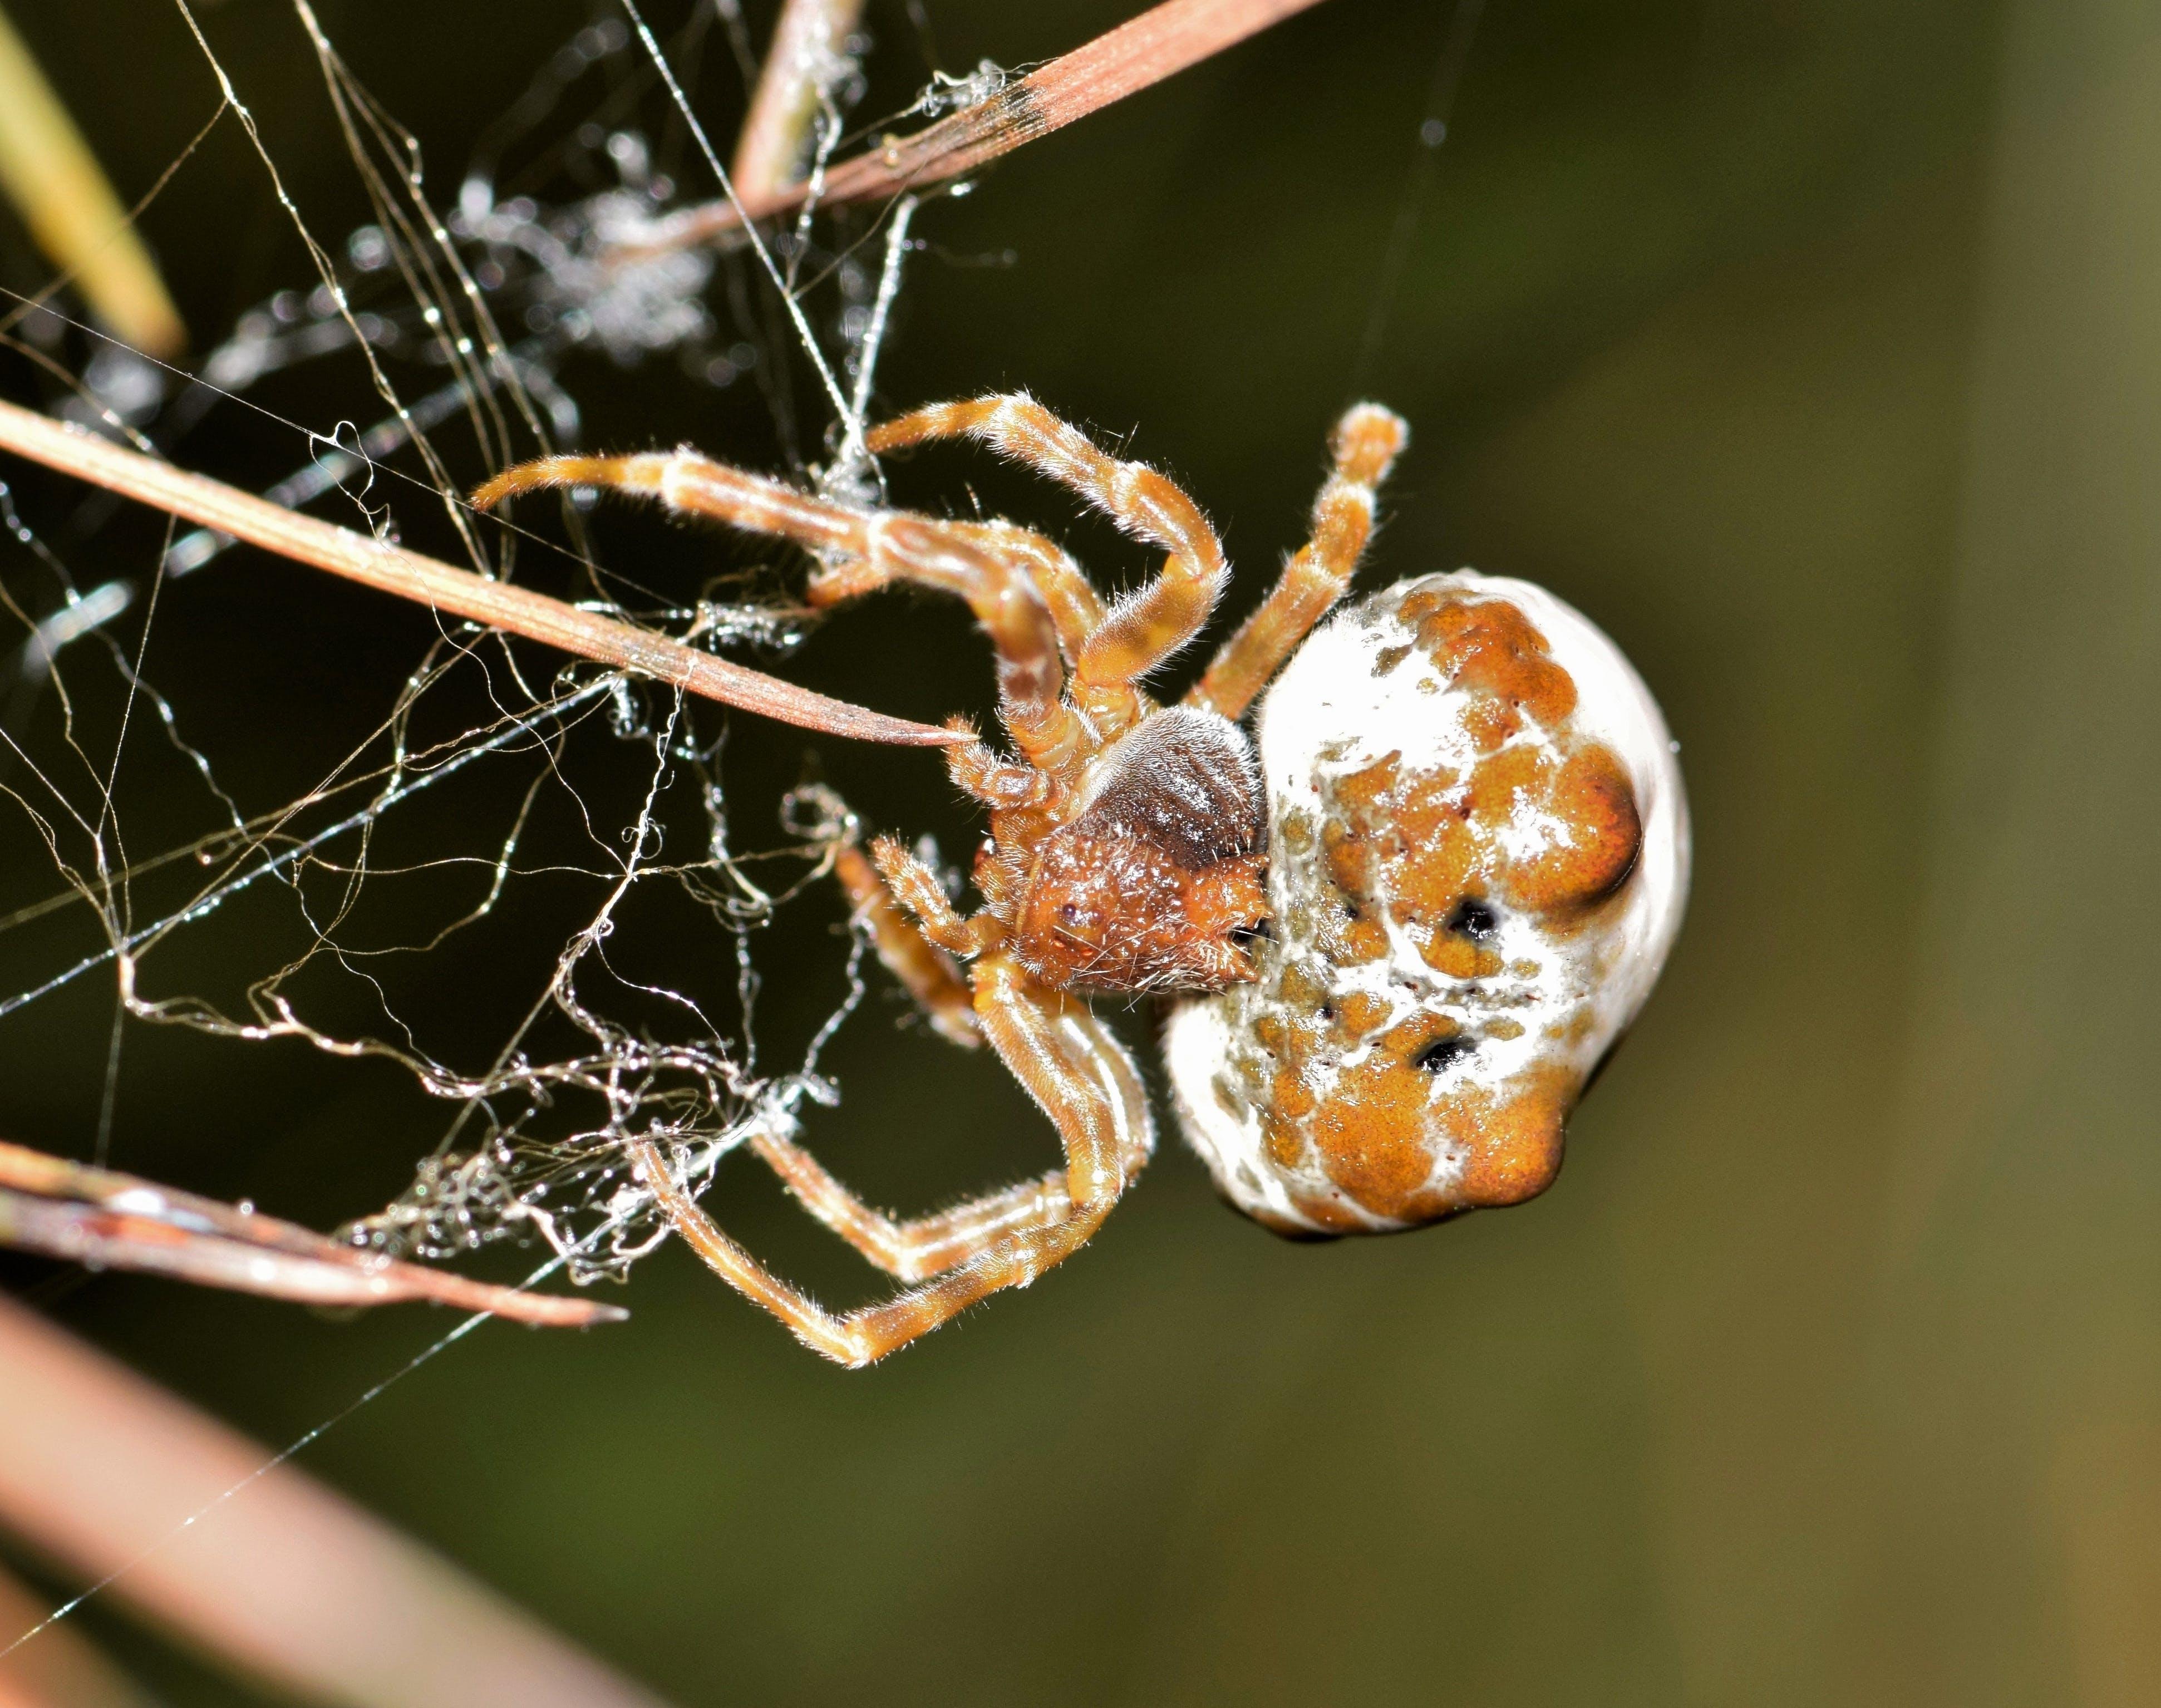 Free stock photo of animal, arachnid, arachnophobia, arthropod